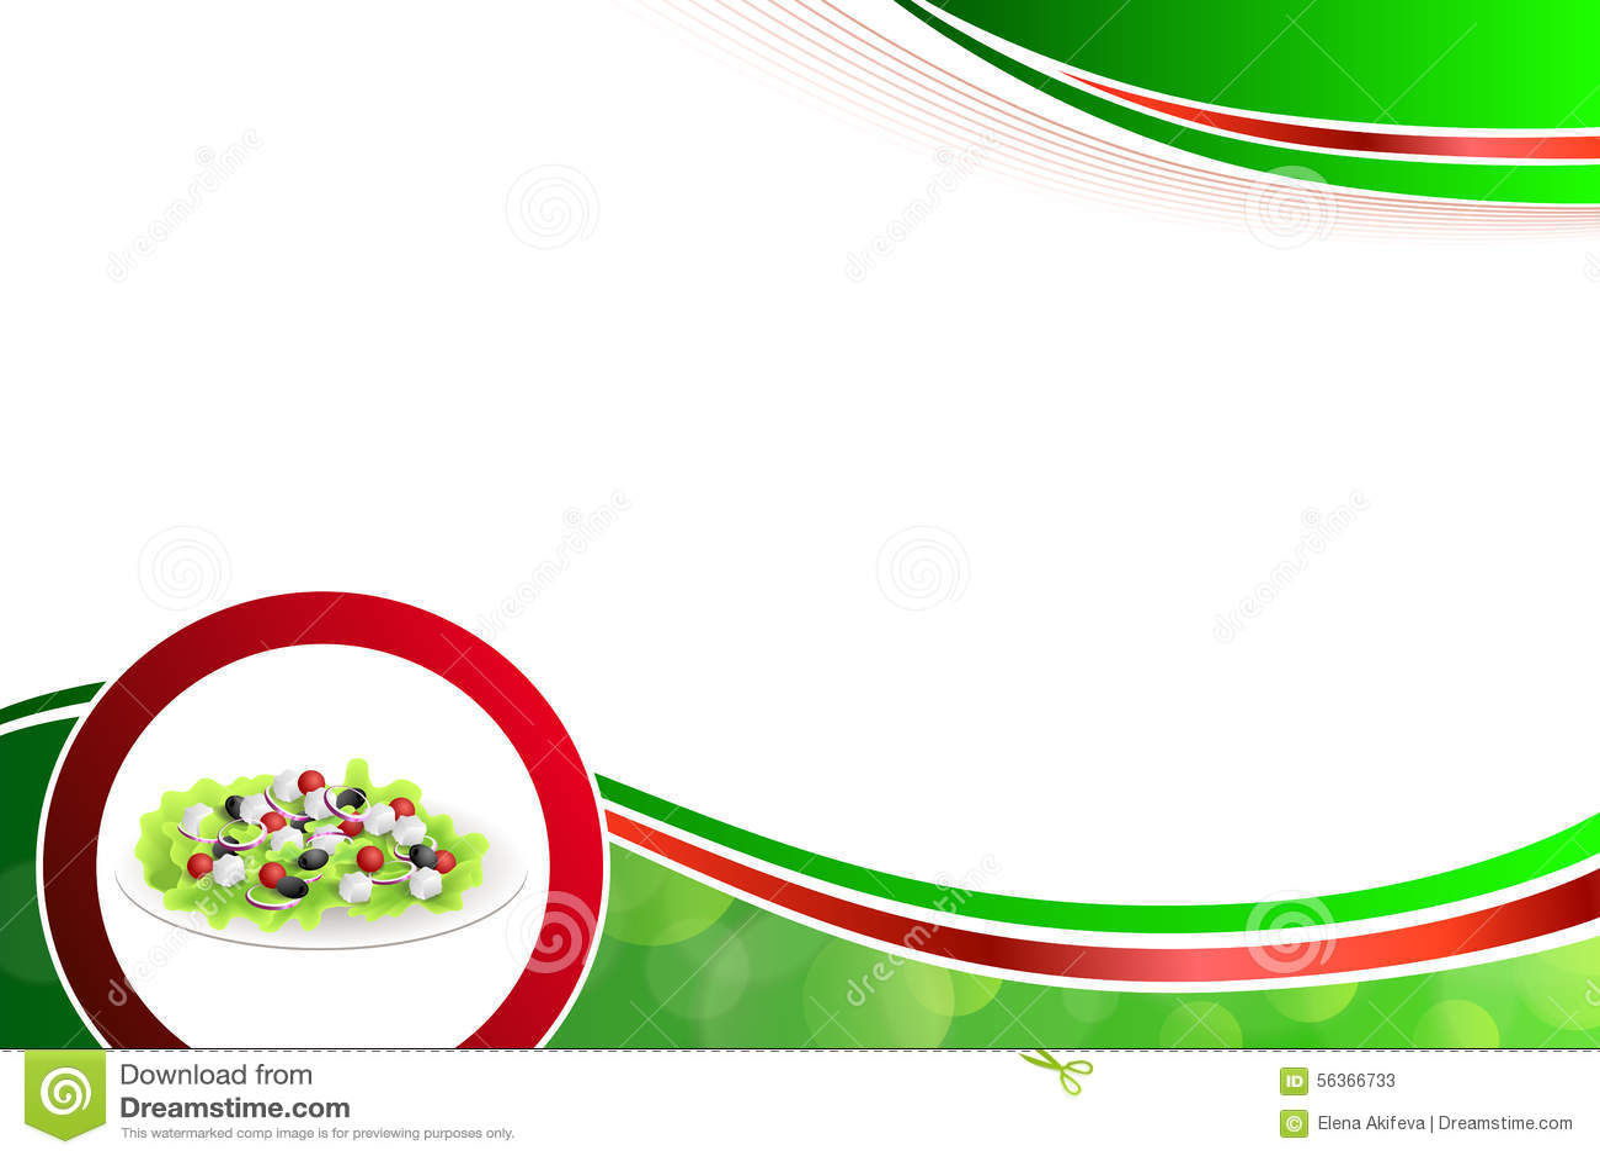 abstract background food greek salad tomato feta cheese tomato clip art free download tomato clip art free download